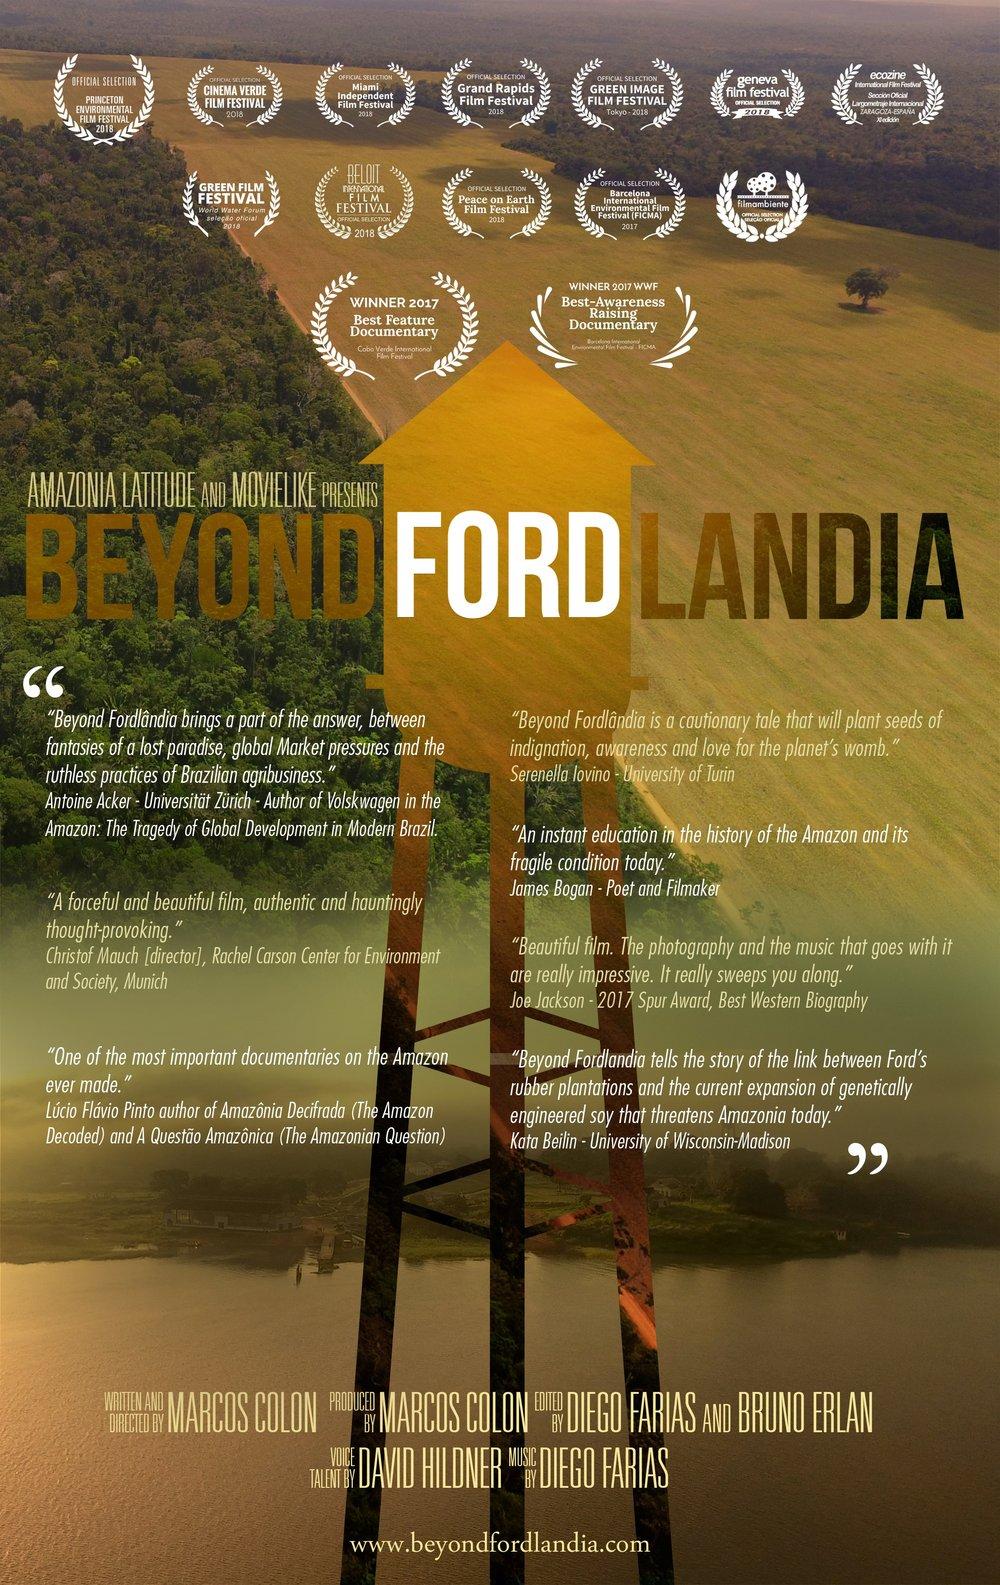 beyond fordlandia 1.jpg